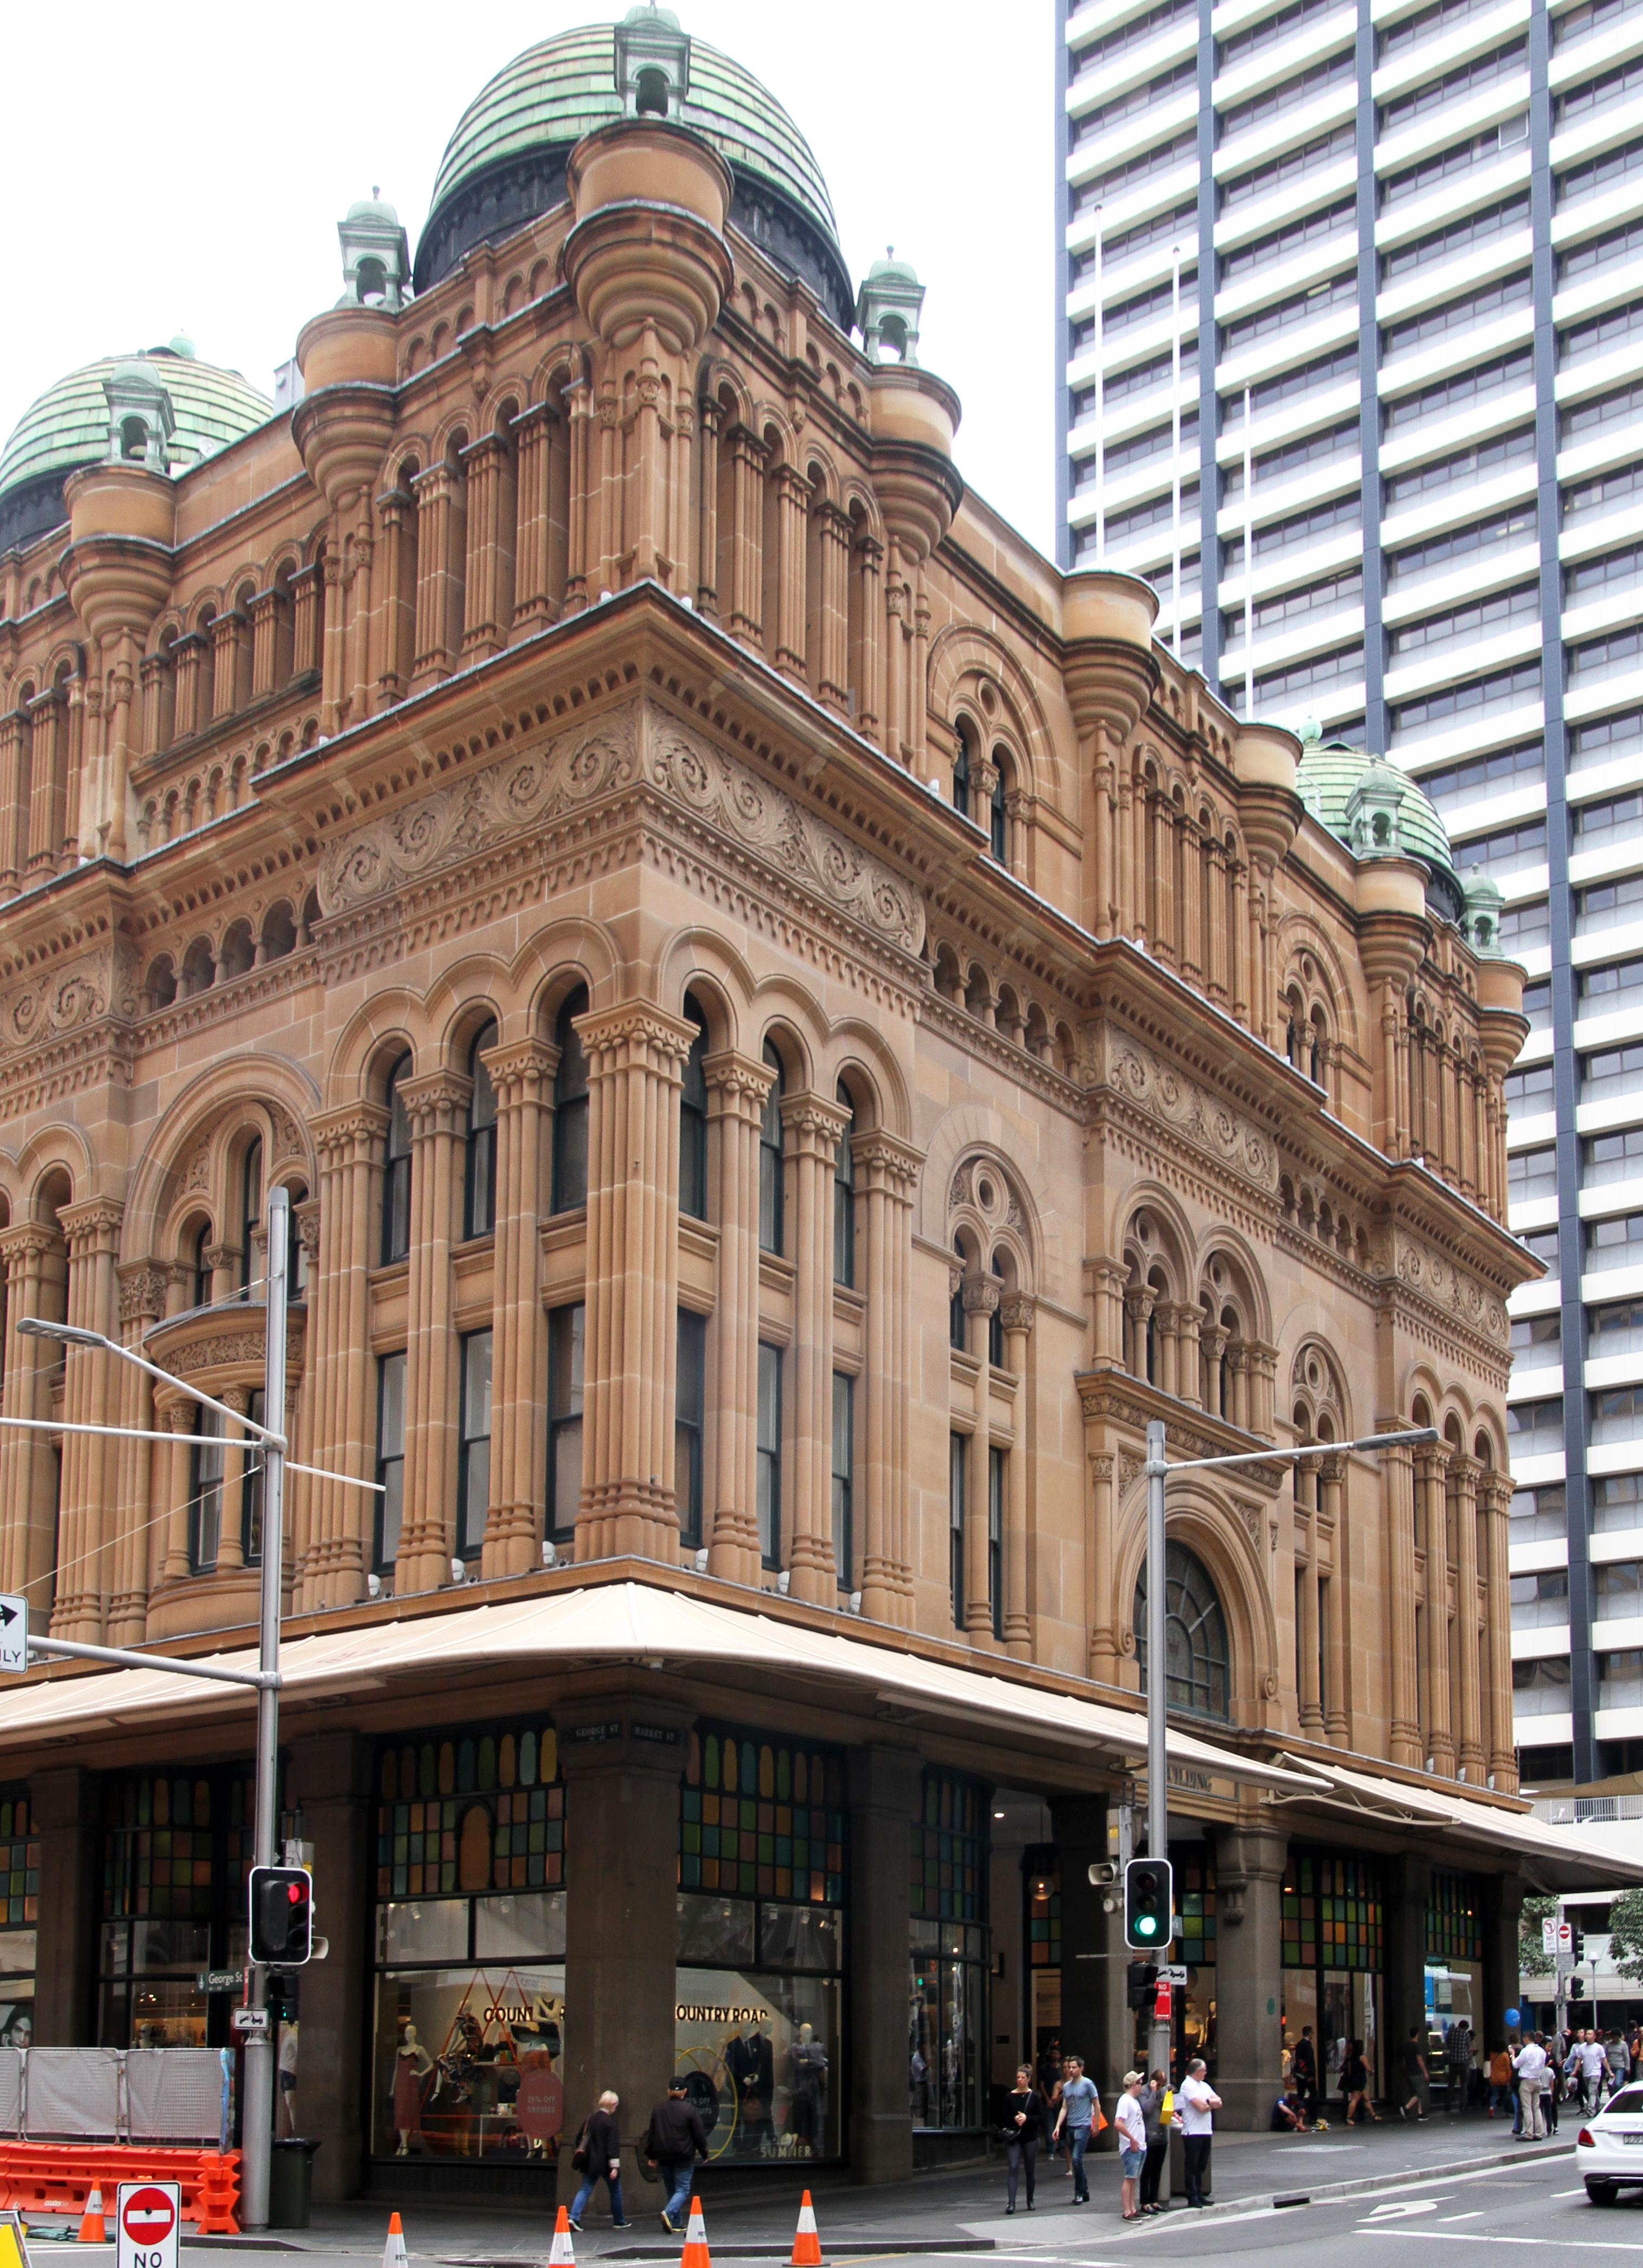 Queen Victoria Building | Sydney, Australia - Official